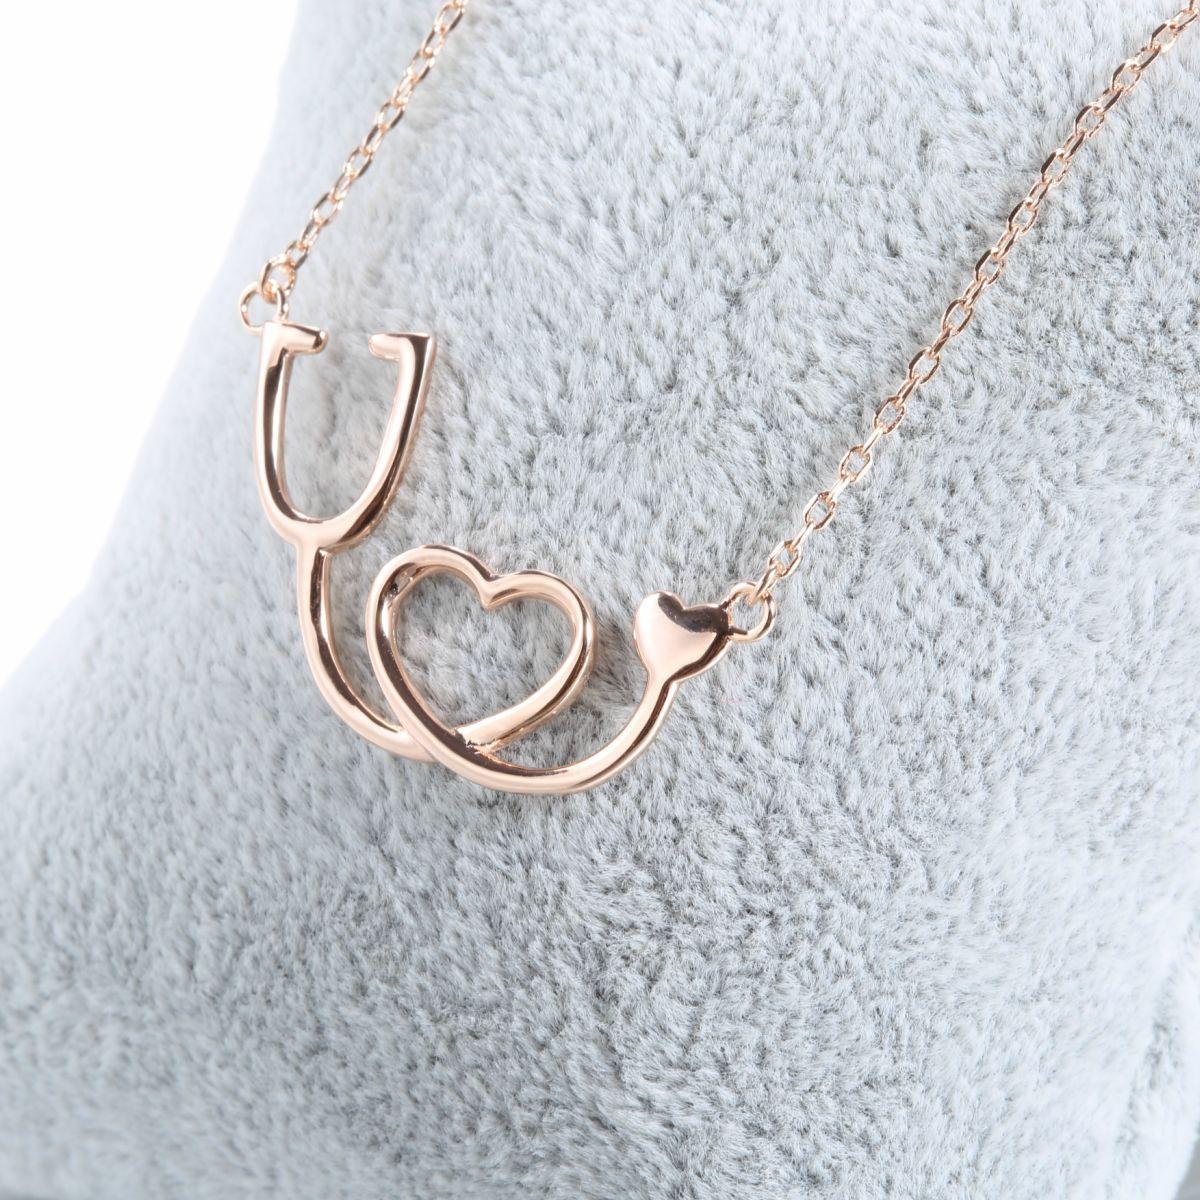 Medical stethoscope heart pendant necklace 925 sterling silver medical stethoscope heart pendant necklace 925 sterling silver mozeypictures Image collections